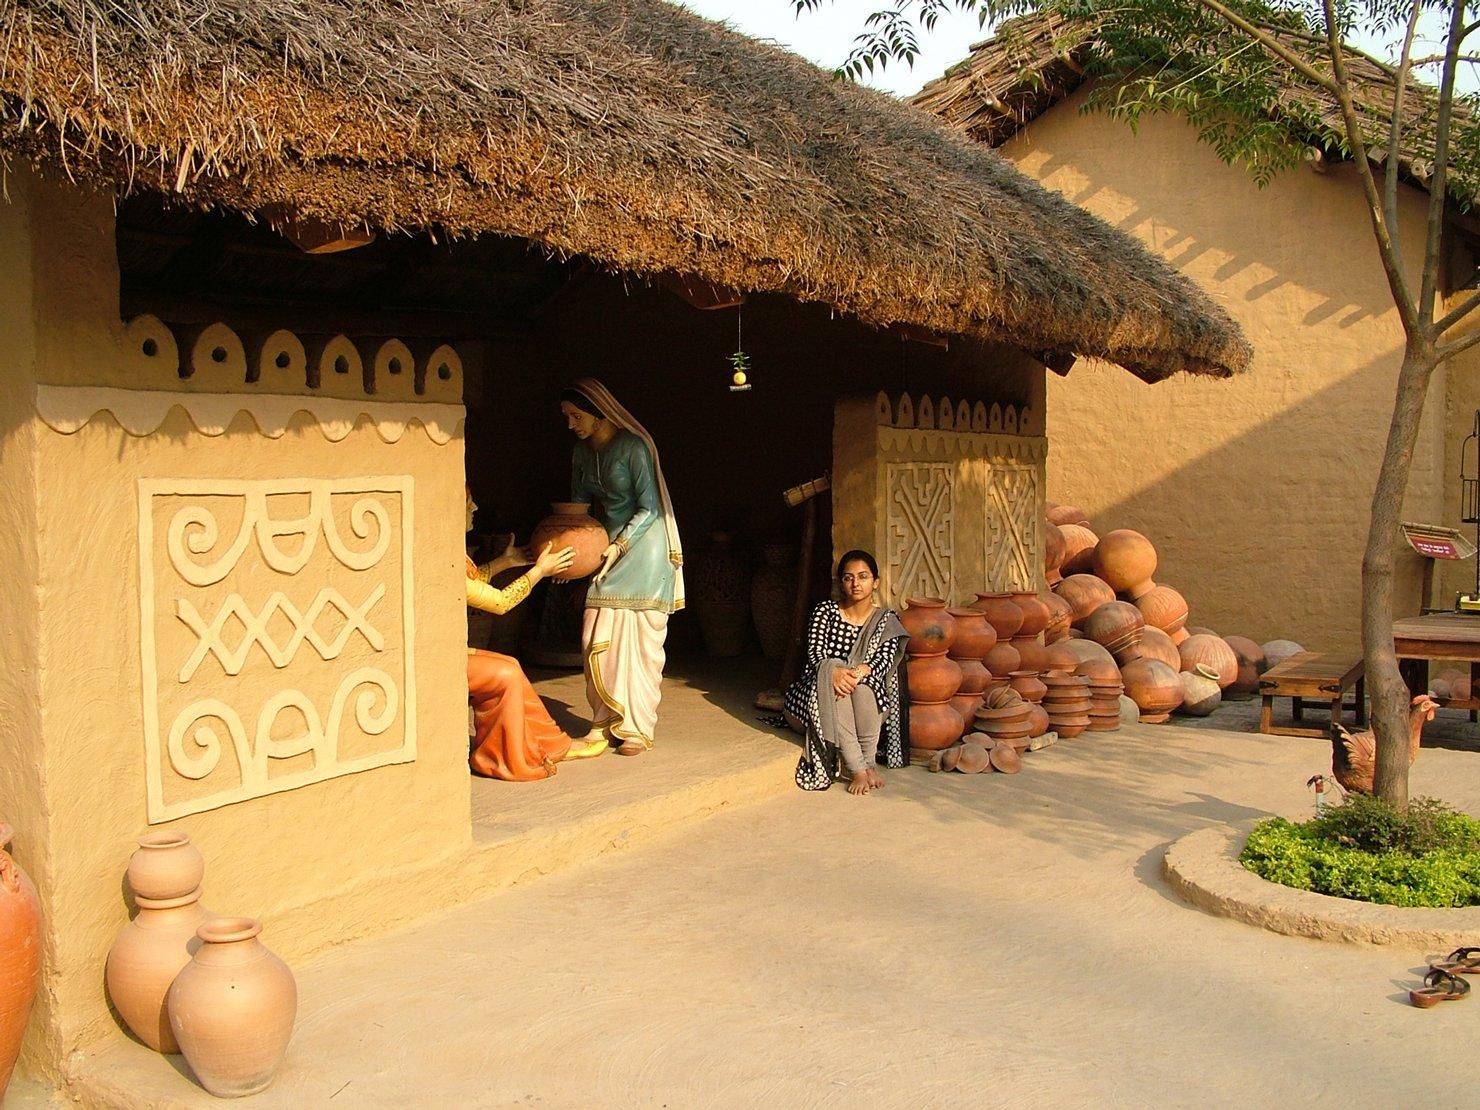 Gratis Indian Village Stock Photo - Freeimagescom-8148